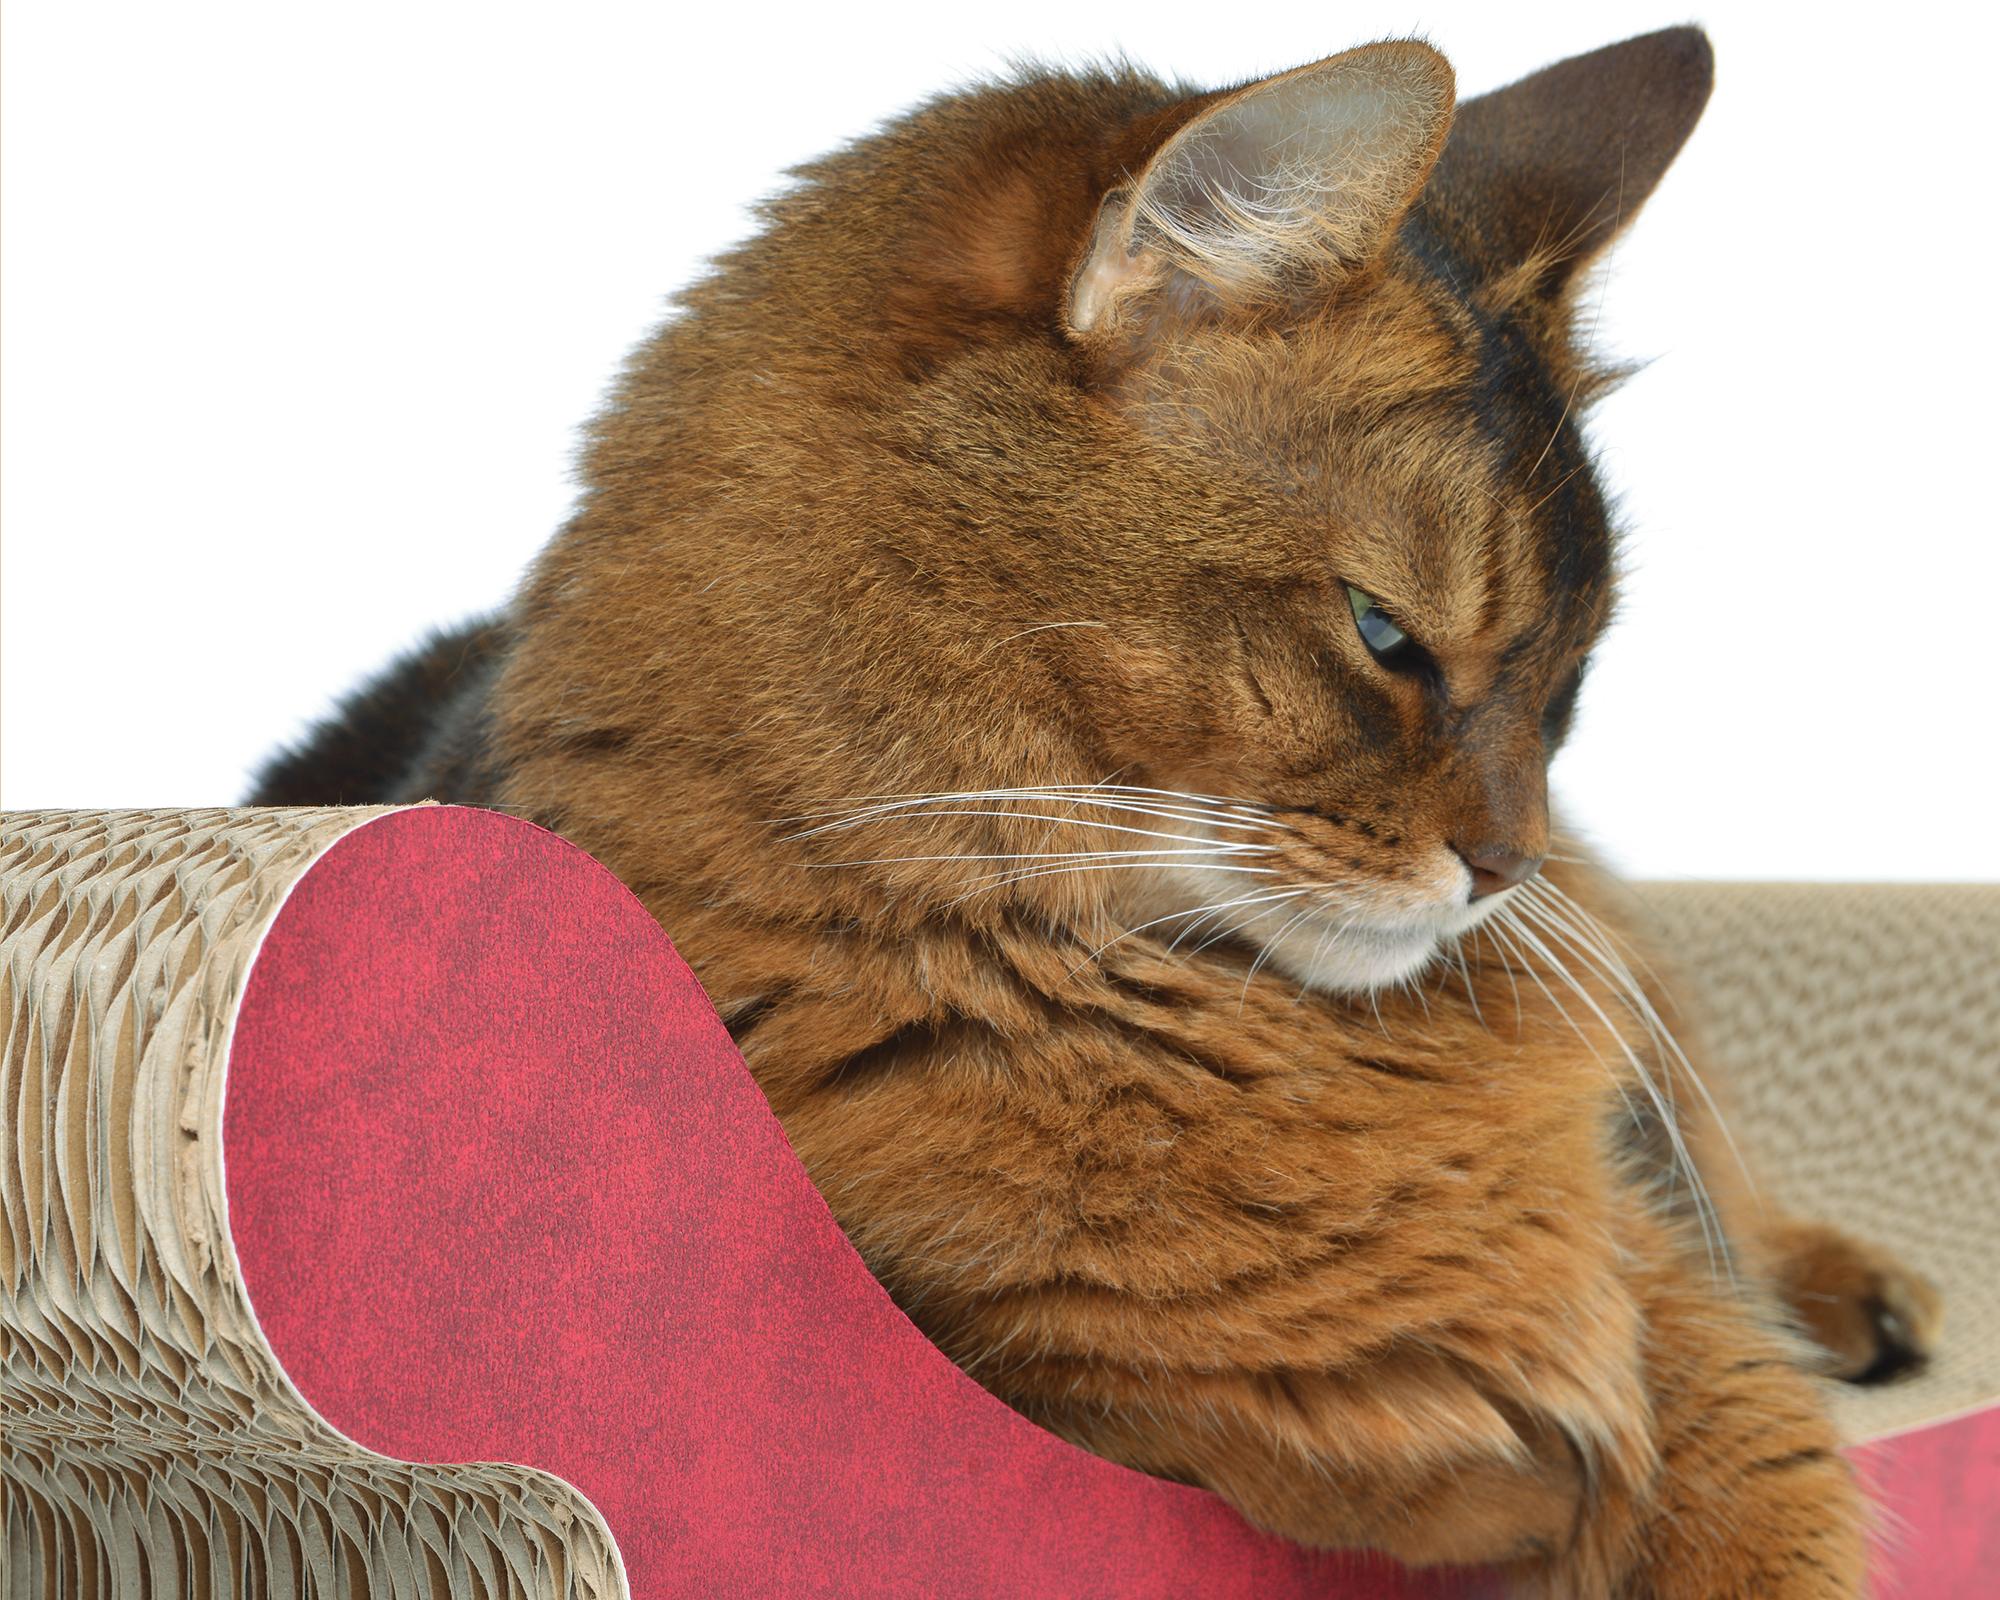 Hochwertige, FSC-zertifizierte Papierapplikationen |Katzenmöbel